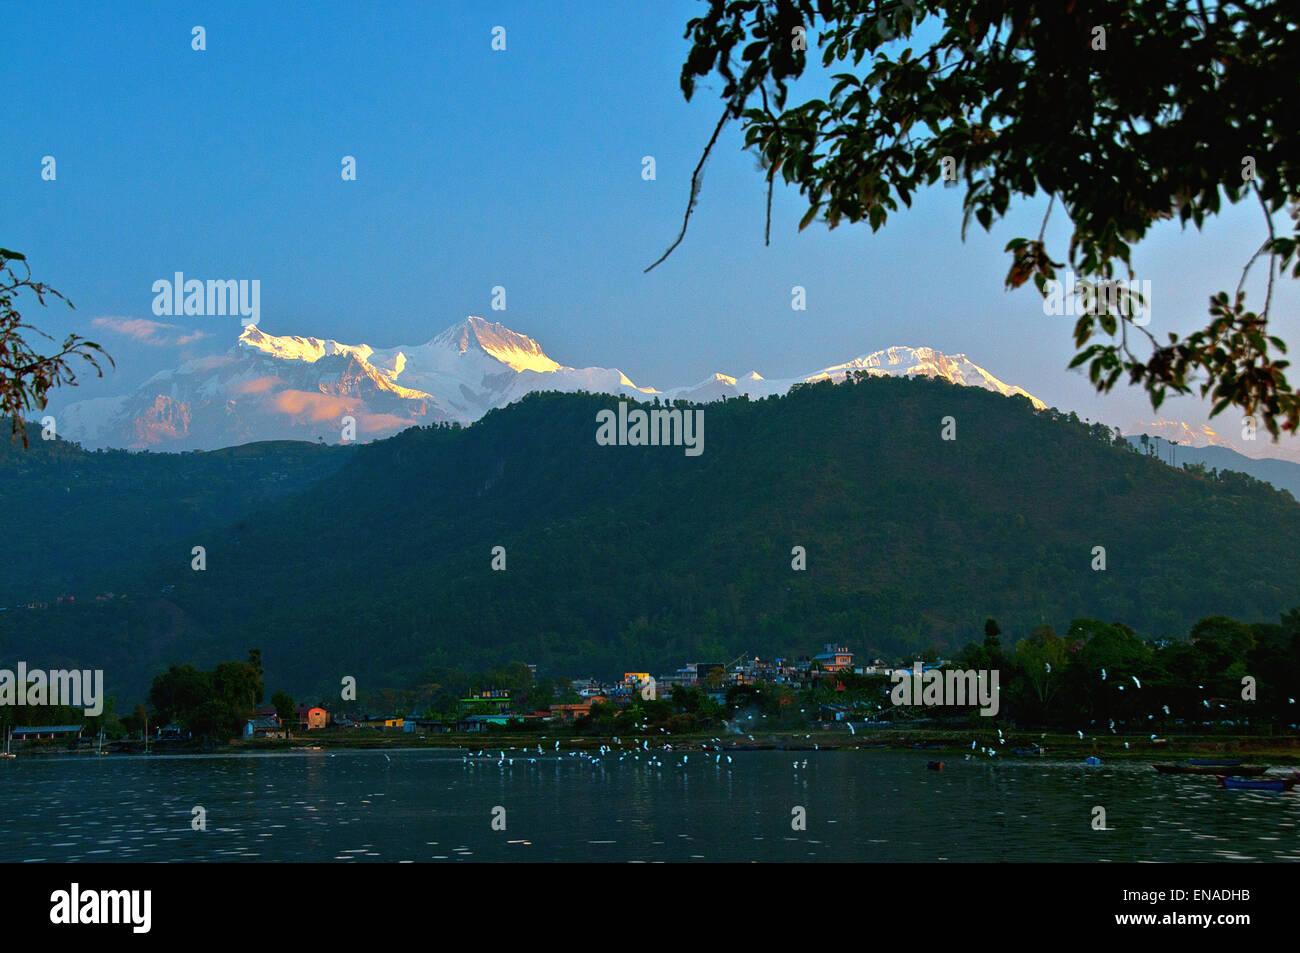 Annapurna range from Phewa lake, Pokhara, Nepal. - Stock Image